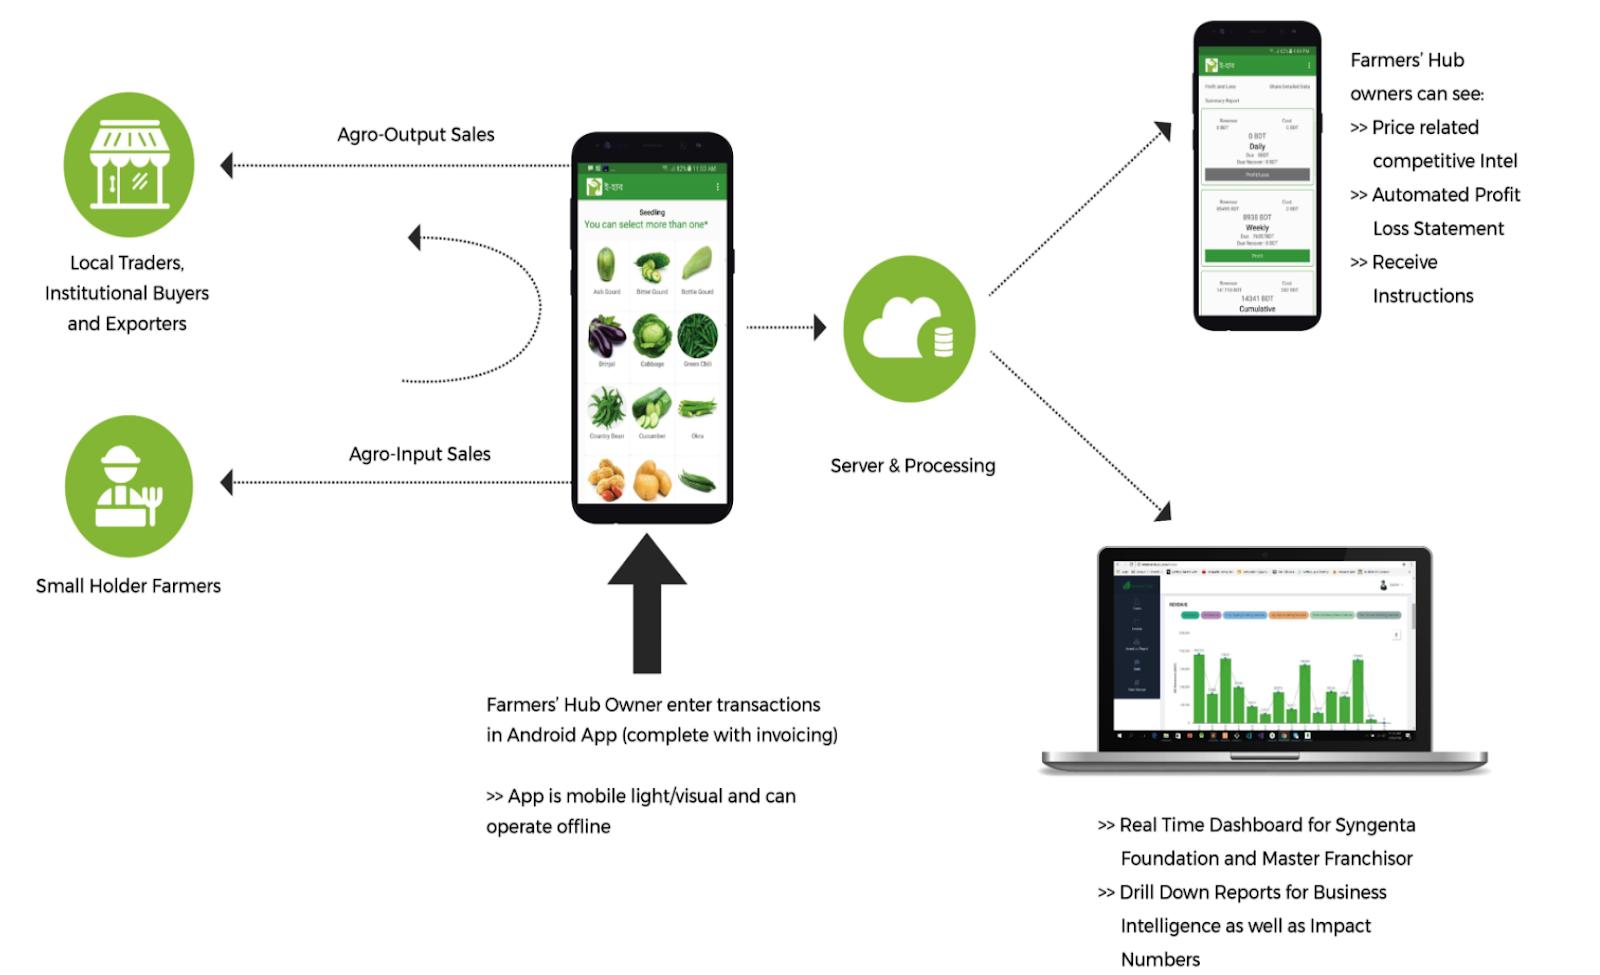 Working Procedure of e-Farmers' Hub - Lightcastle Partners & SFSA